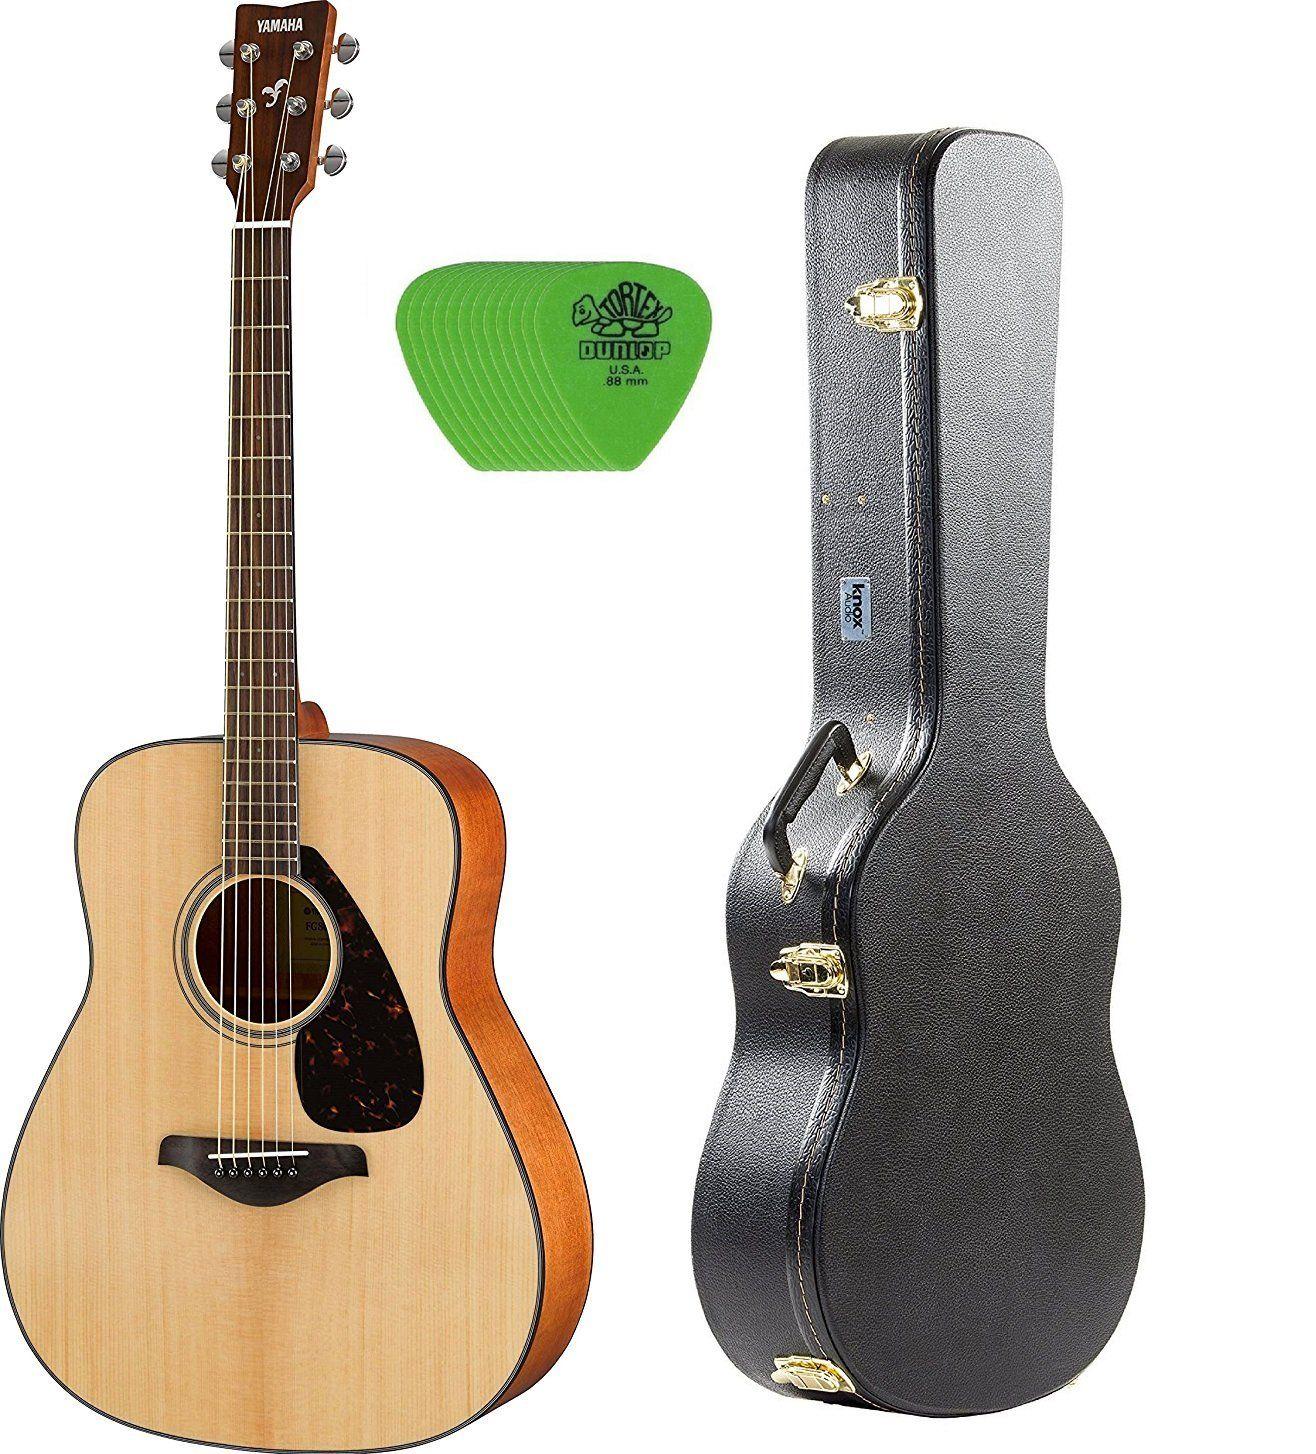 MonkeyJack 6pcs Acoustic Folk Guitar Tuning Pegs Tuner Machine Heads Replacement Handle